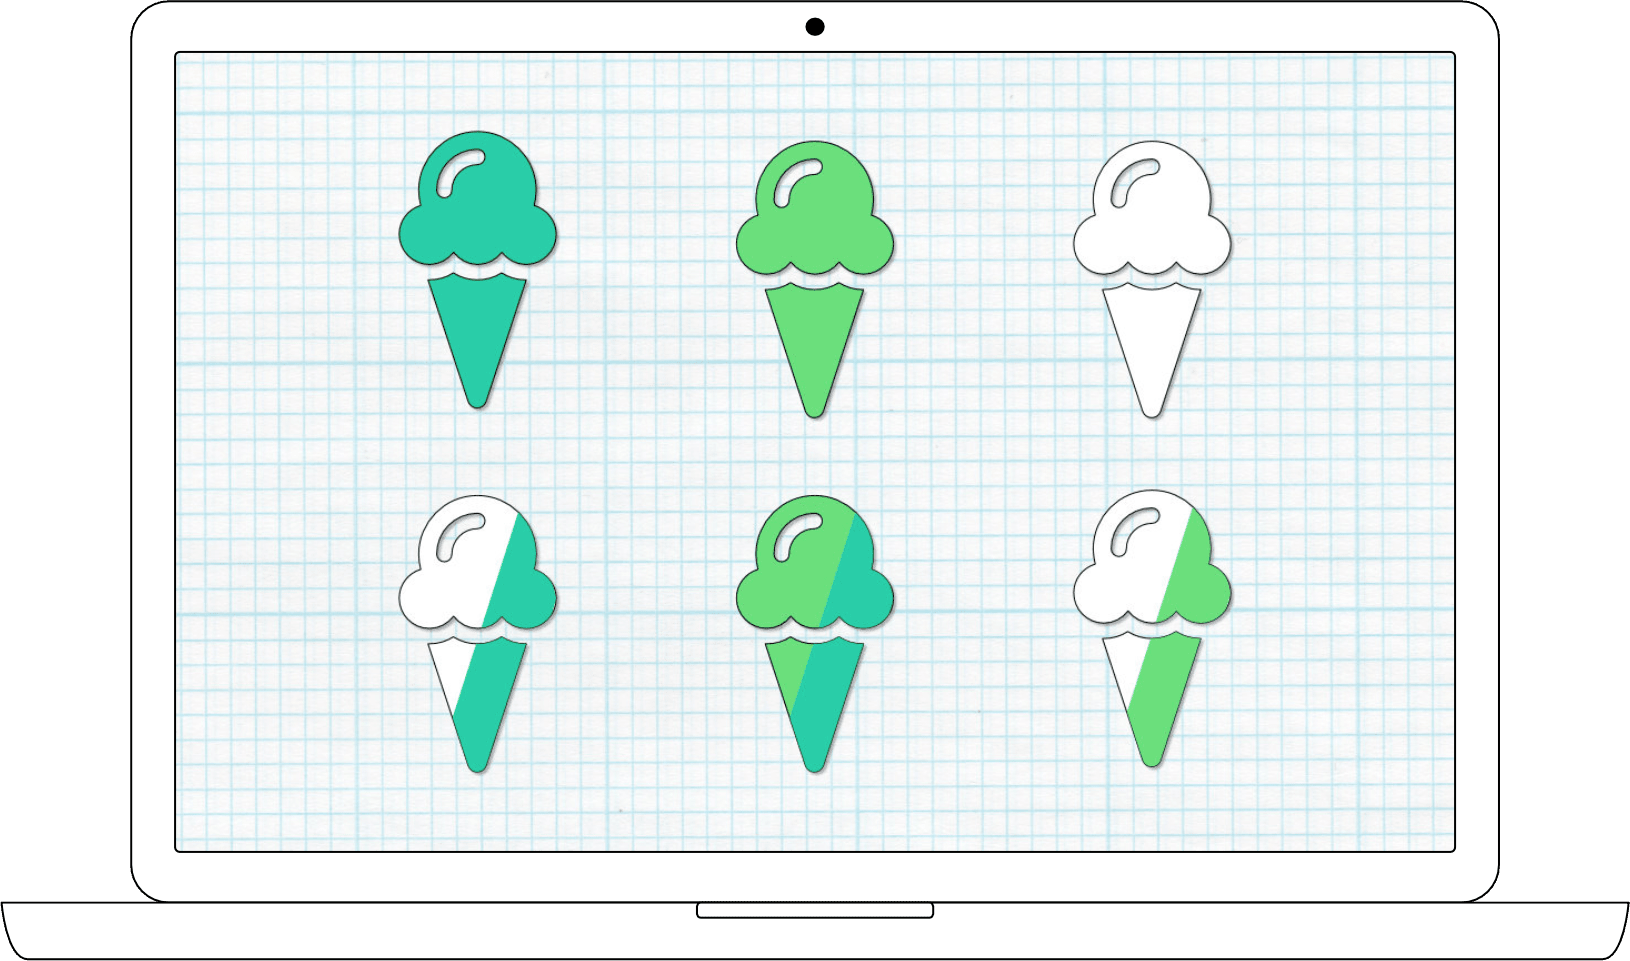 Custom map pins including split color designs for indecisive participants